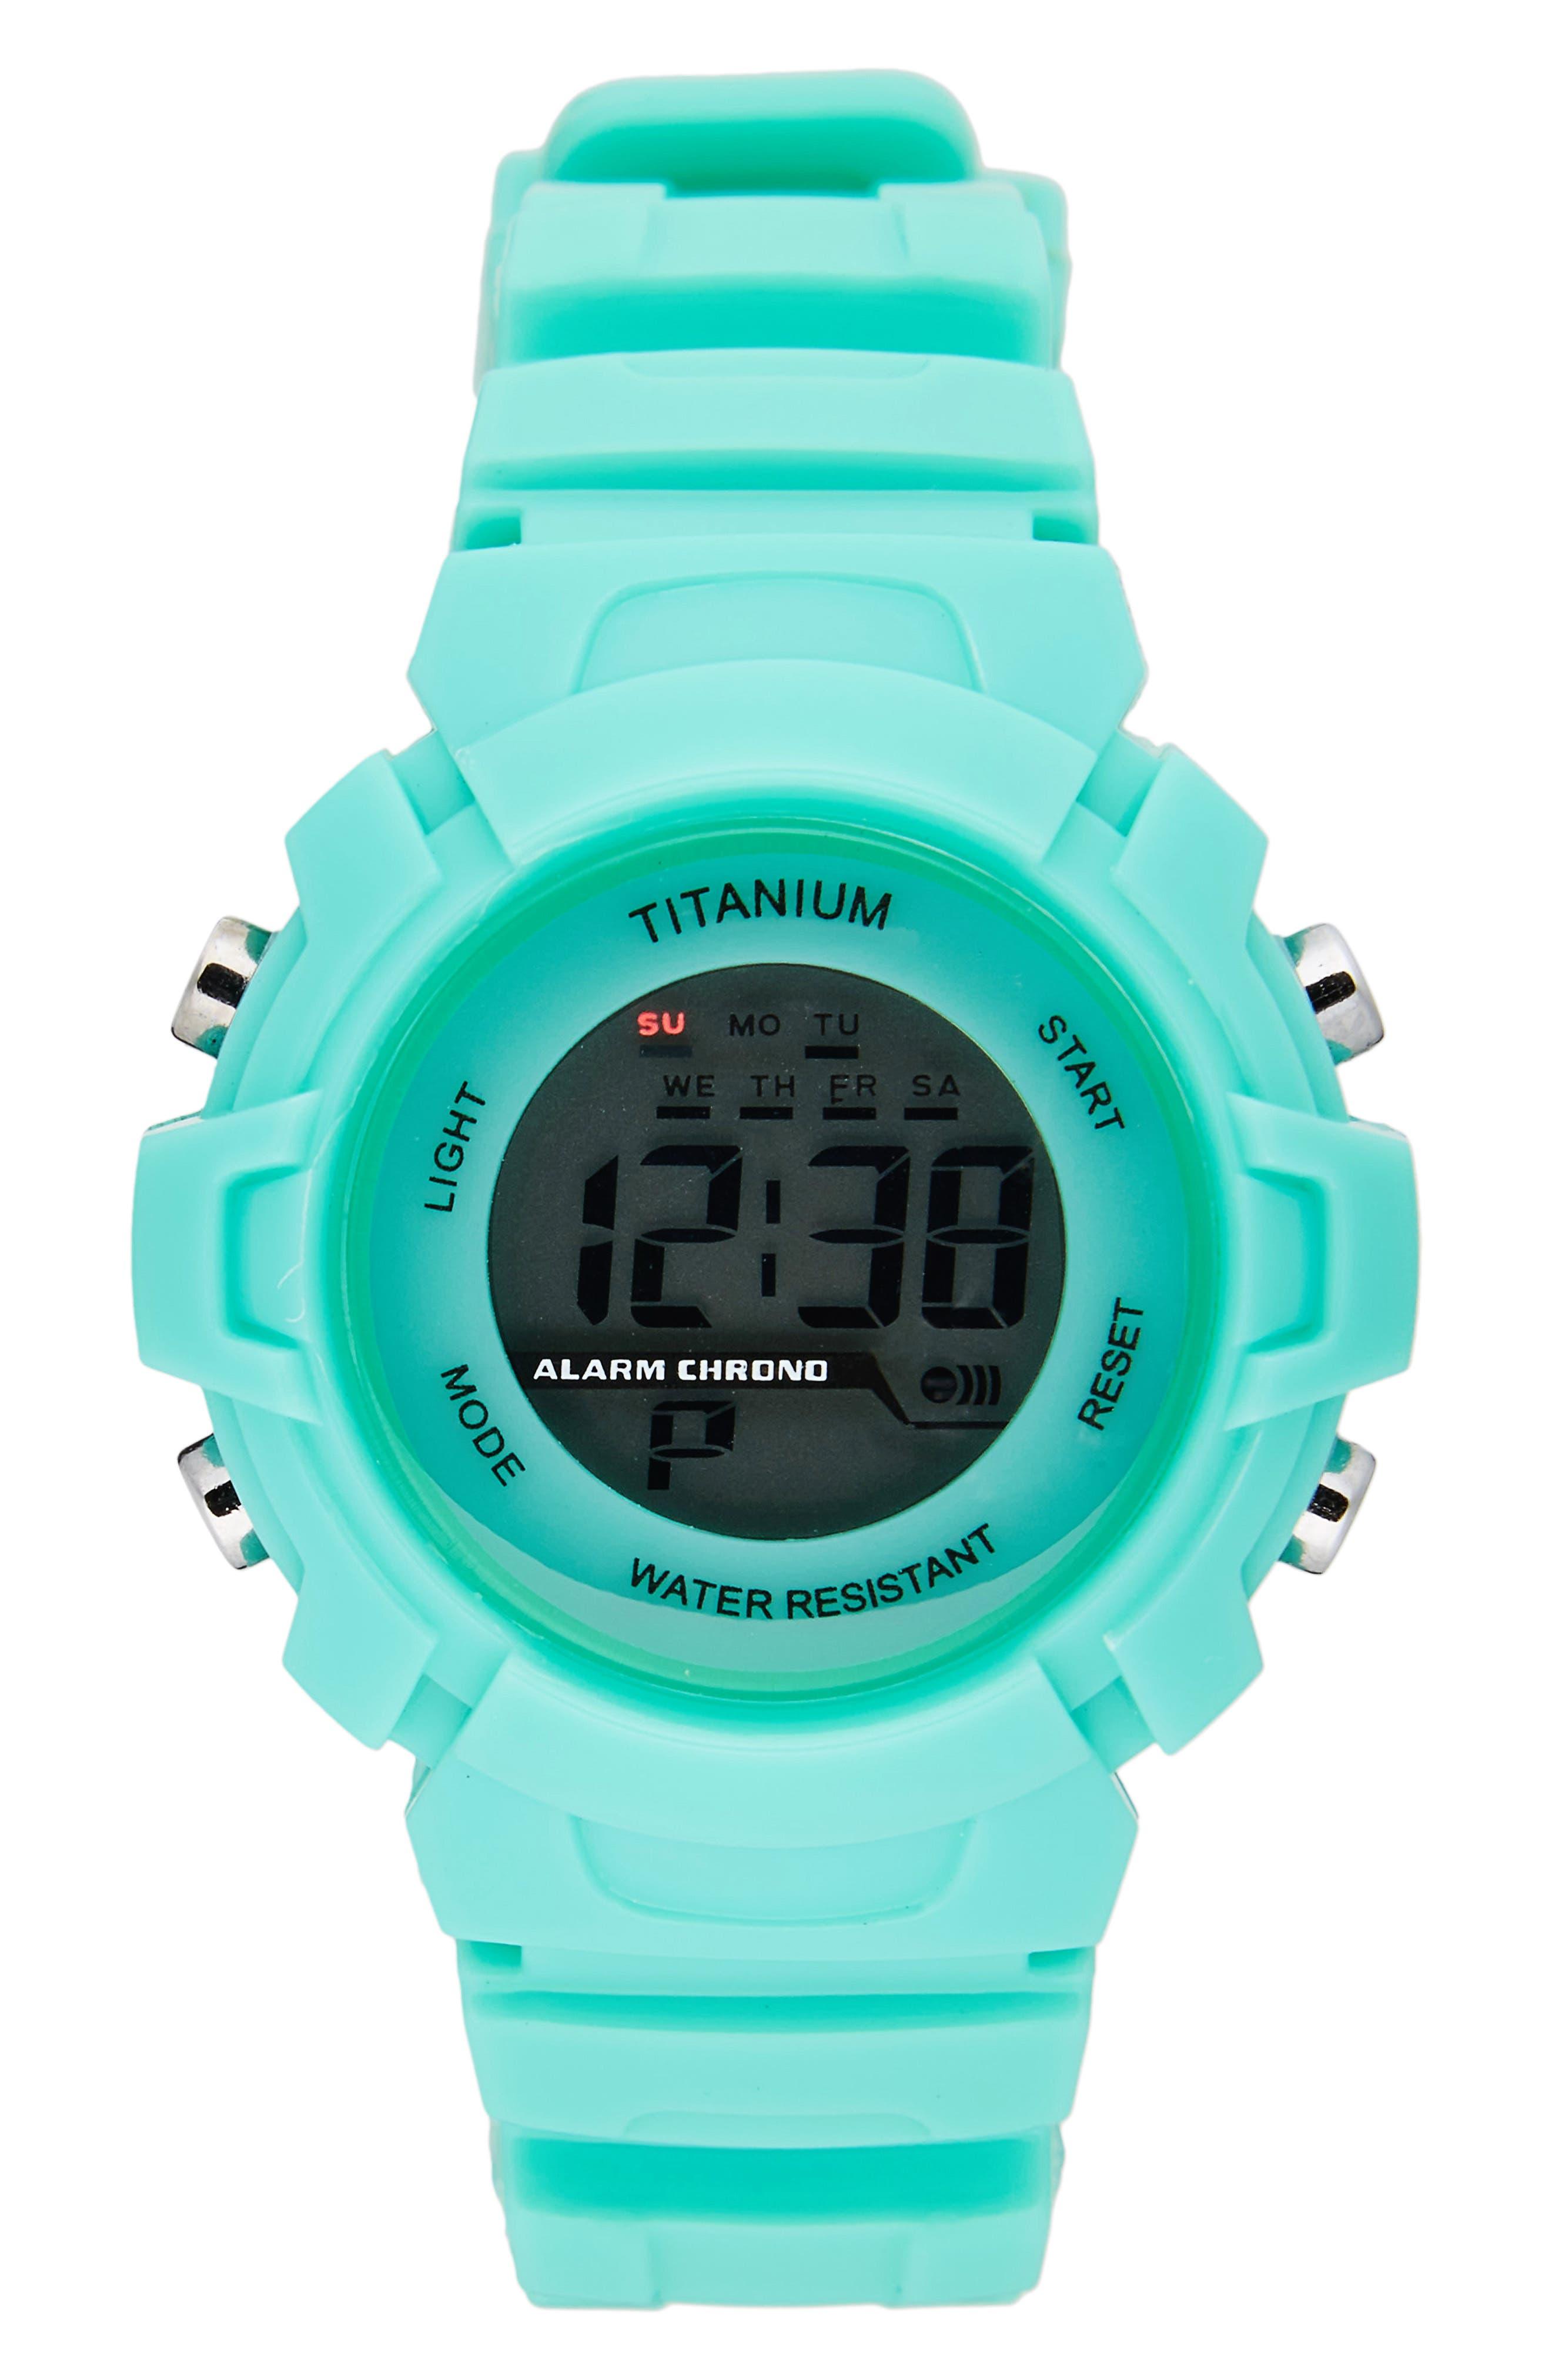 TITANIUM LCD Waterproof Sport Watch